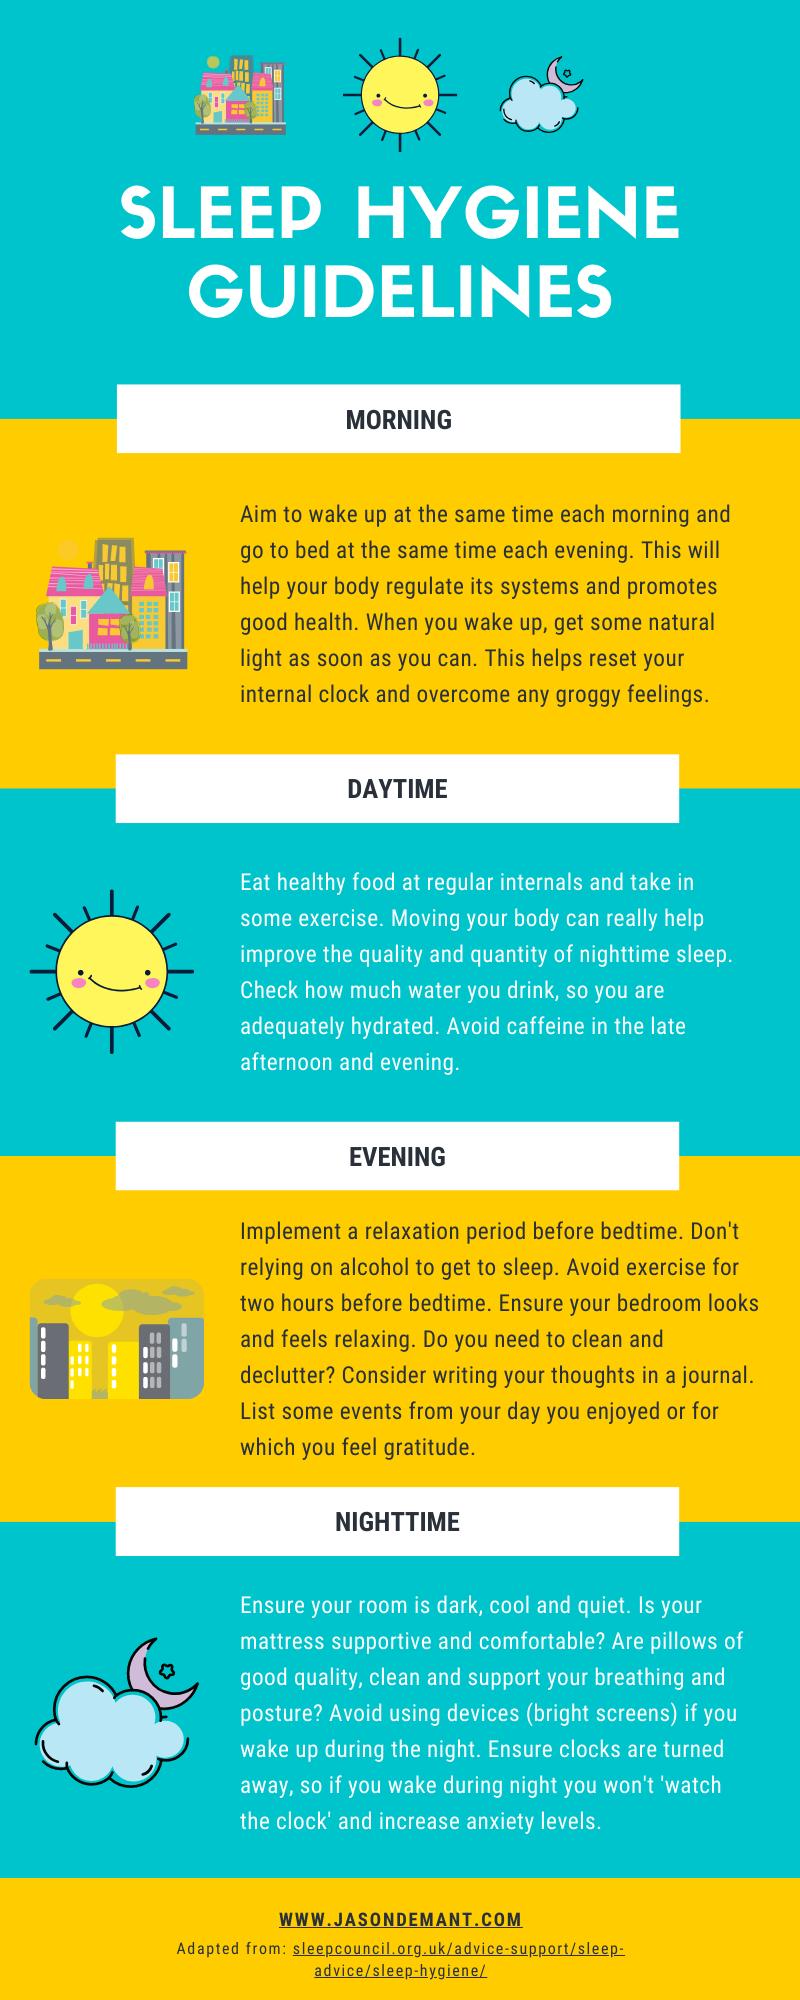 Sleep Hygiene Activities to Help You Sleep Soundly